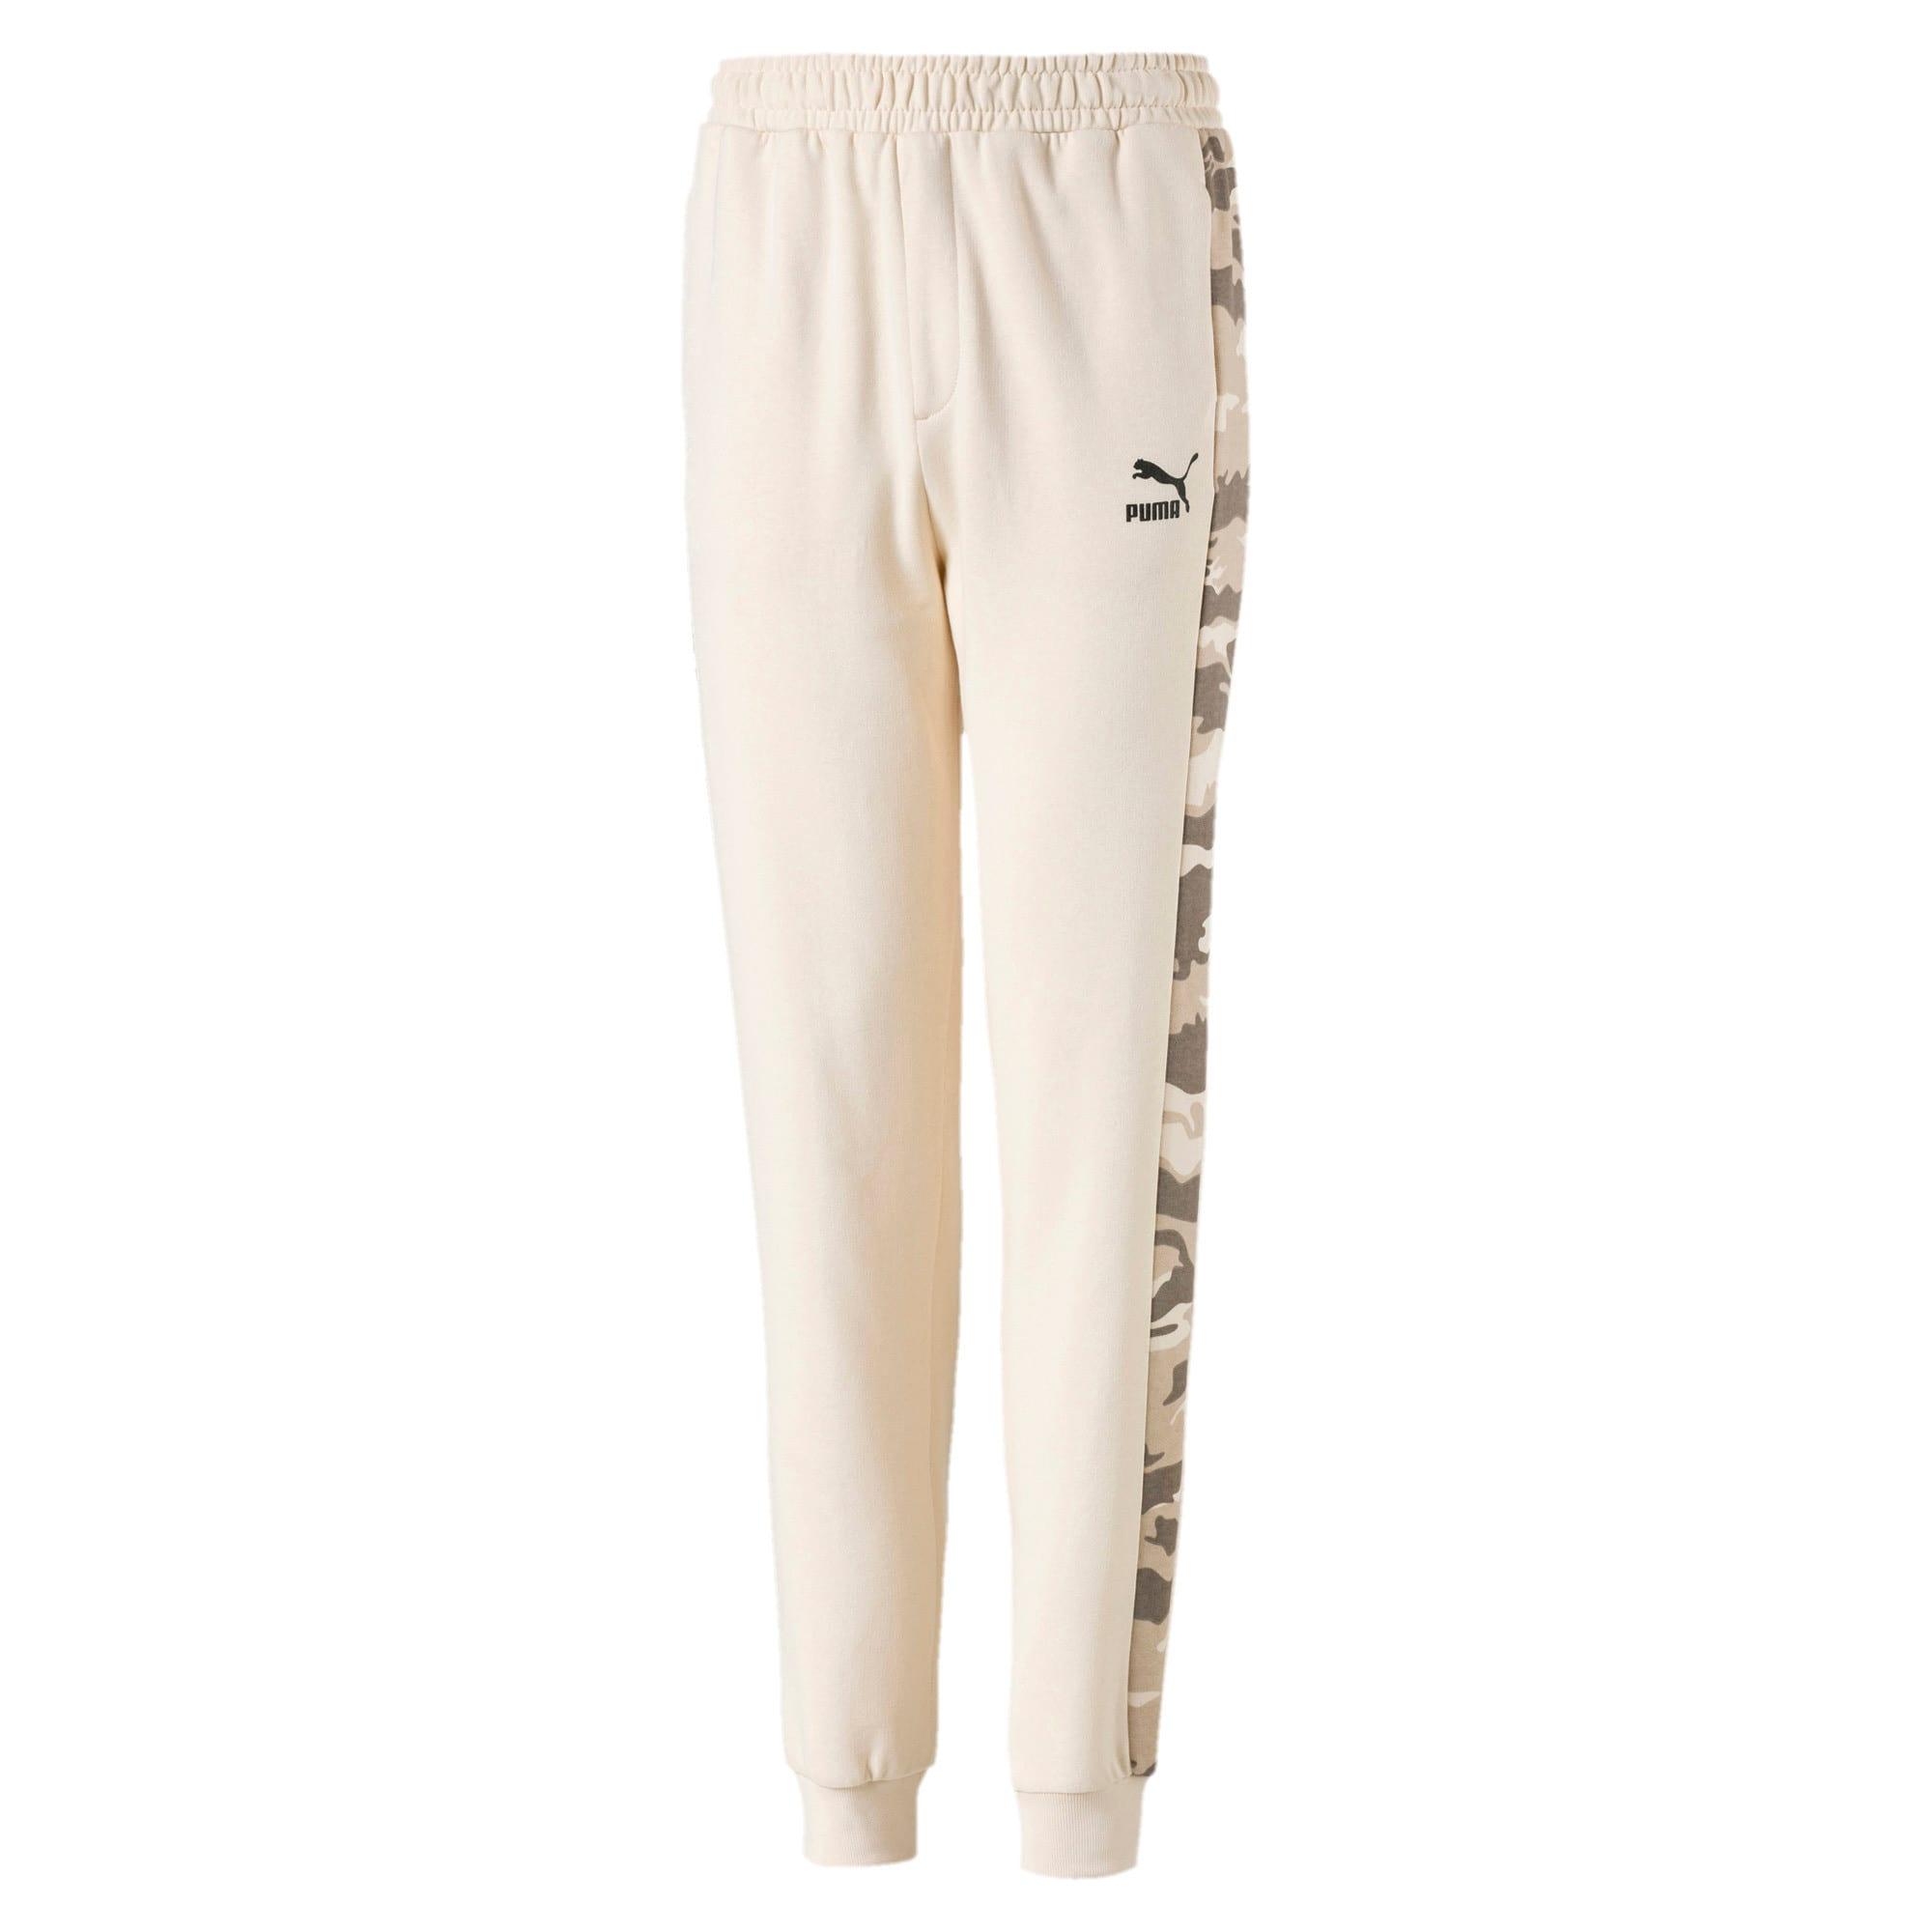 Thumbnail 1 of Toelopende streetwear sweatpants voor kinderen, White Swan, medium